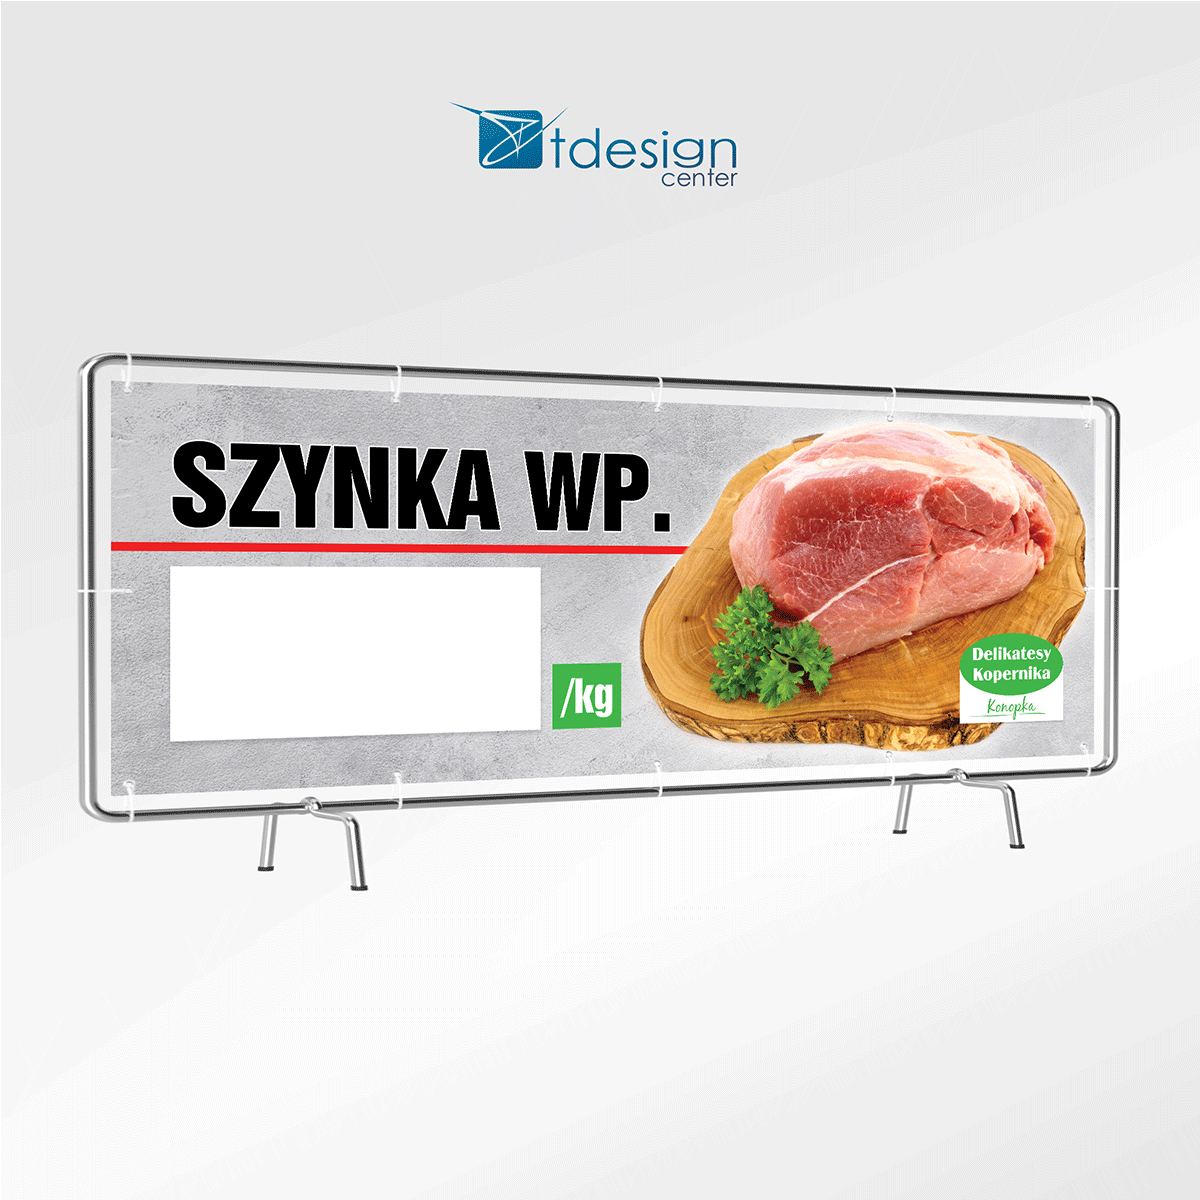 "Baner 200x70cm - projekt + druk - realizacja dla Delikatesów Kopernika ""Konopka"""